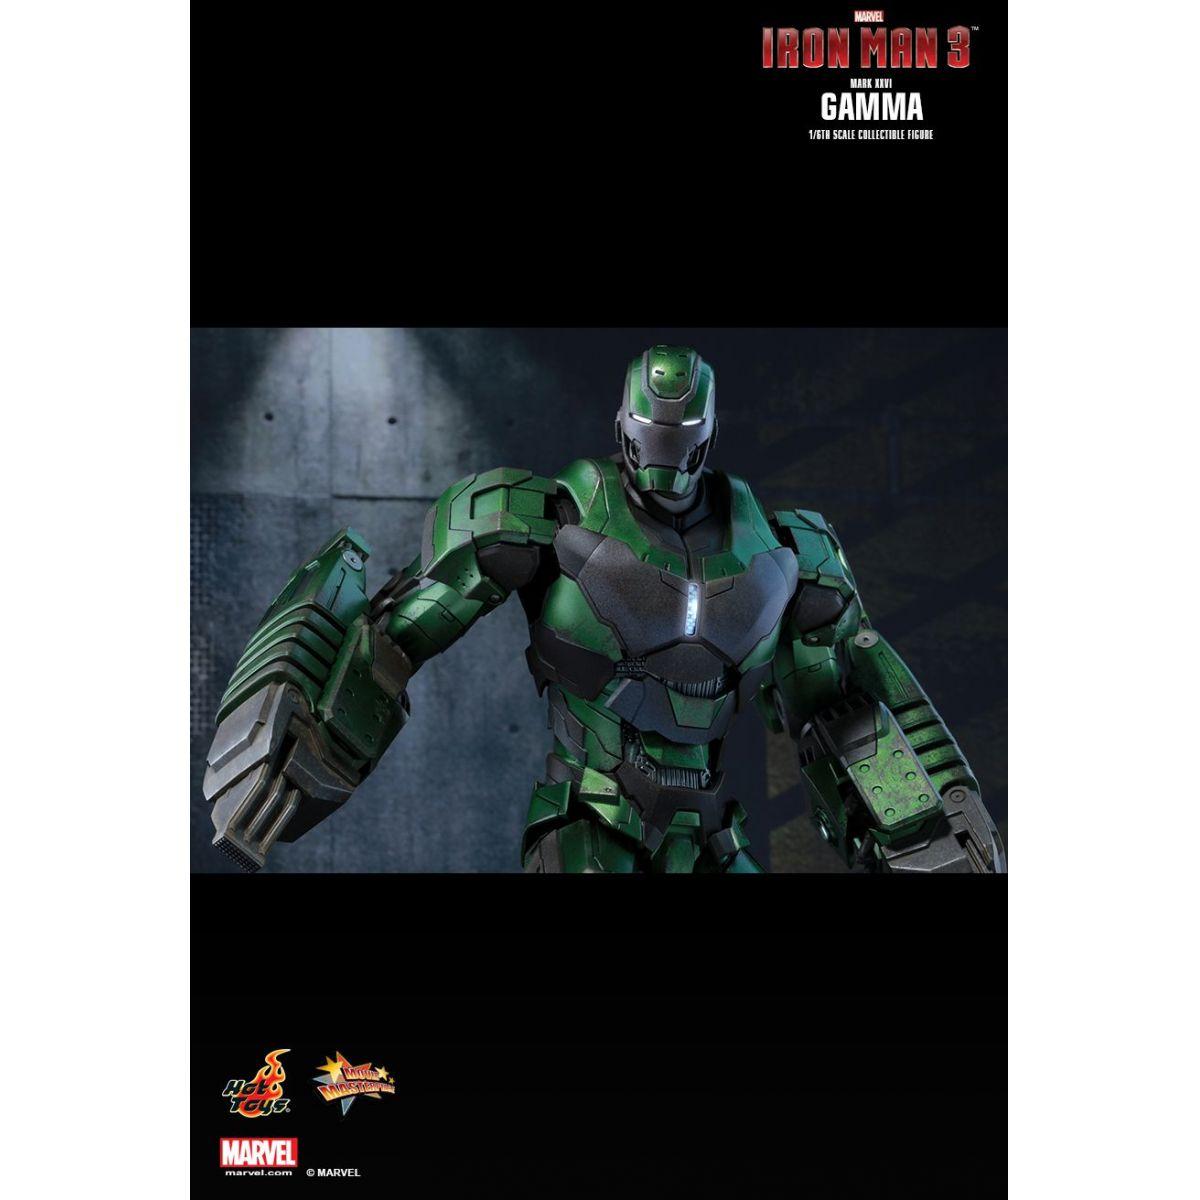 Boneco Iron Man Mark XXVI Gamma: Homem de Ferro 3 (Iron Man 3) Exclusive Escala 1/6 - Hot Toys